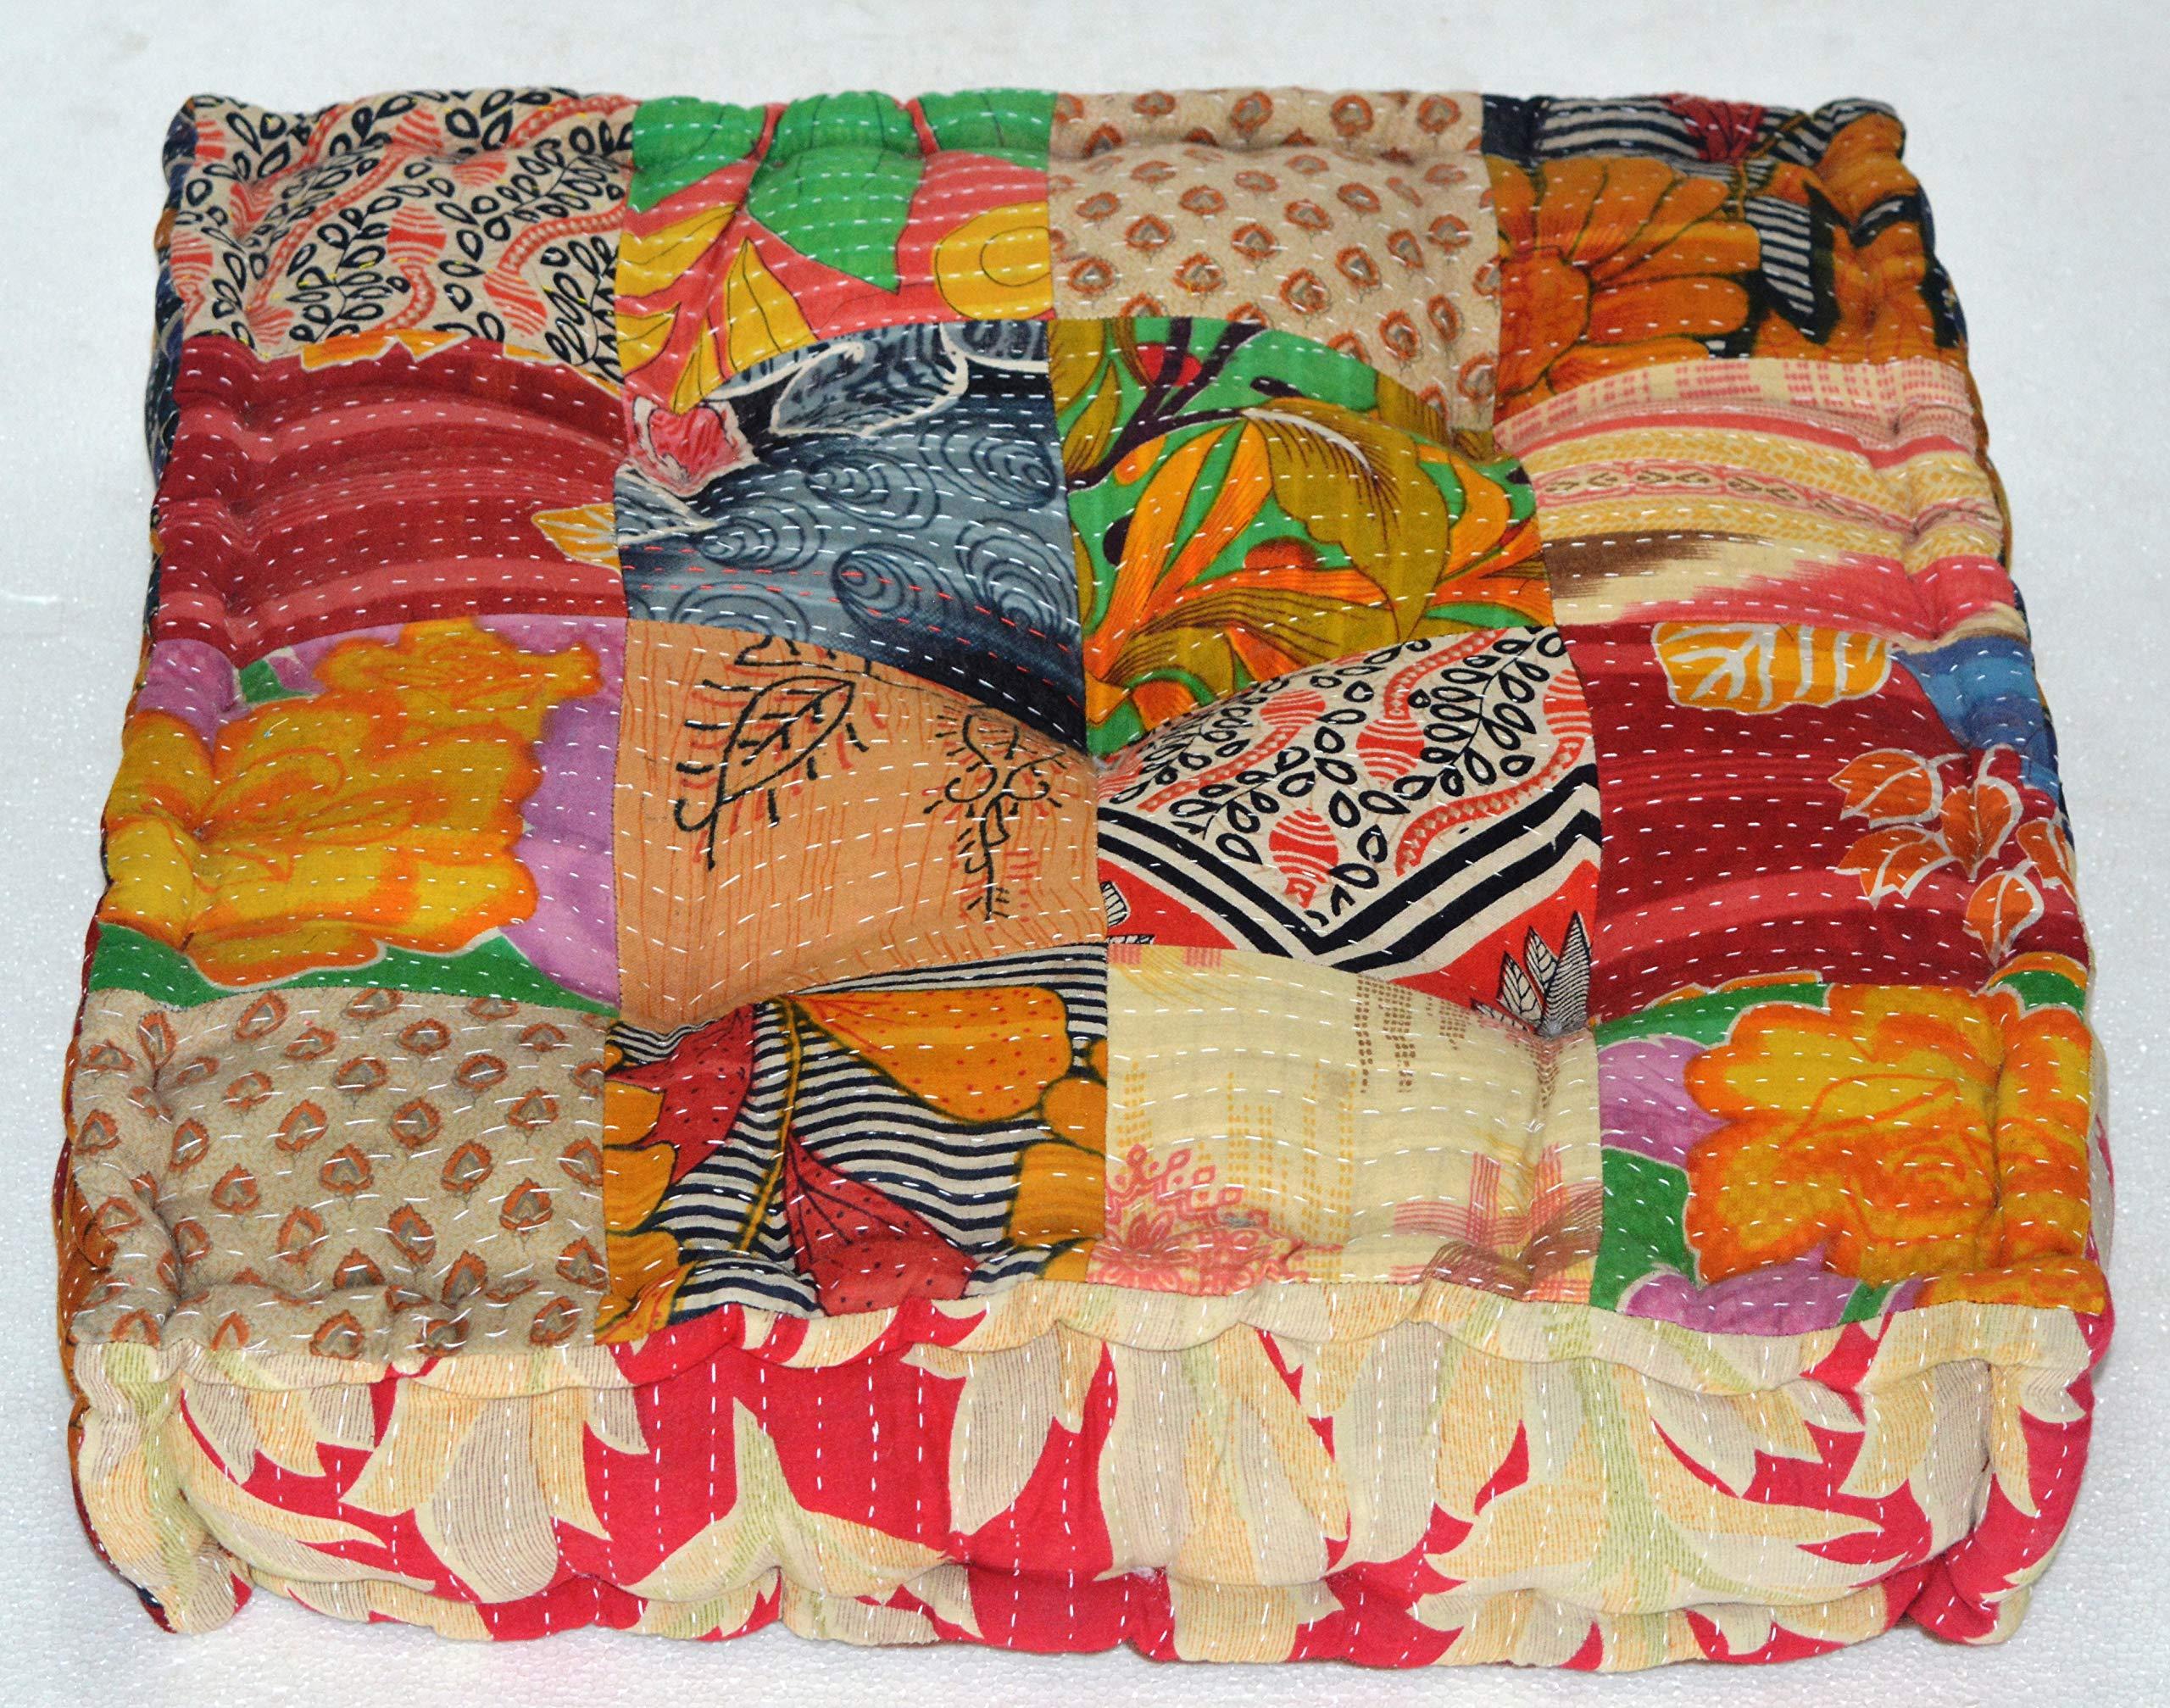 MARUDHARA RANGILA Stuffed Indian Vintage Kantha Patch Floor Cushion; Pouf Ottoman; Floor Pillow Yoga Pillow 16 Patch